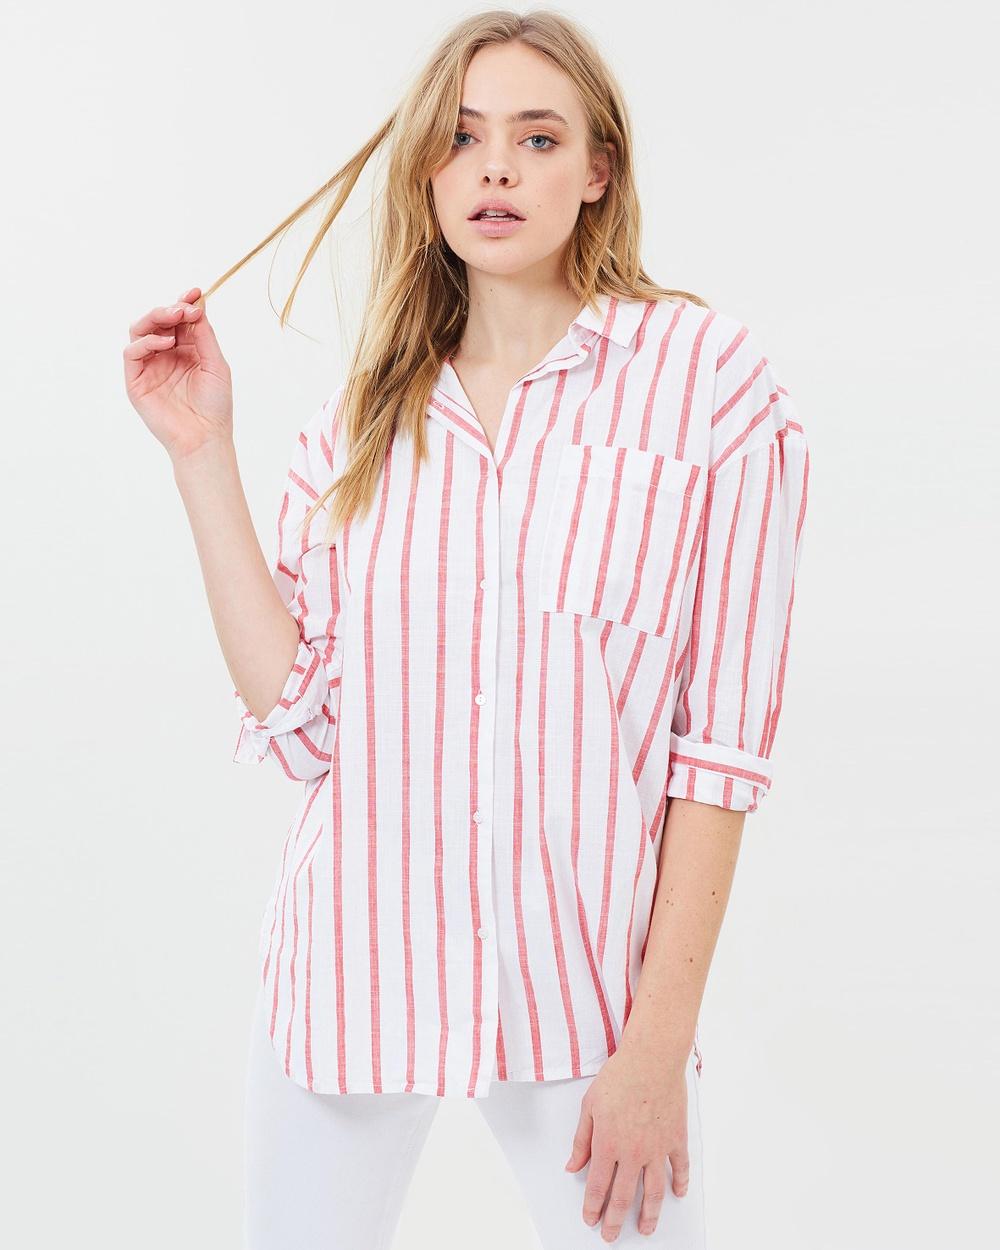 Cotton On Monique Shirt Tops Jack White Stripe Monique Shirt